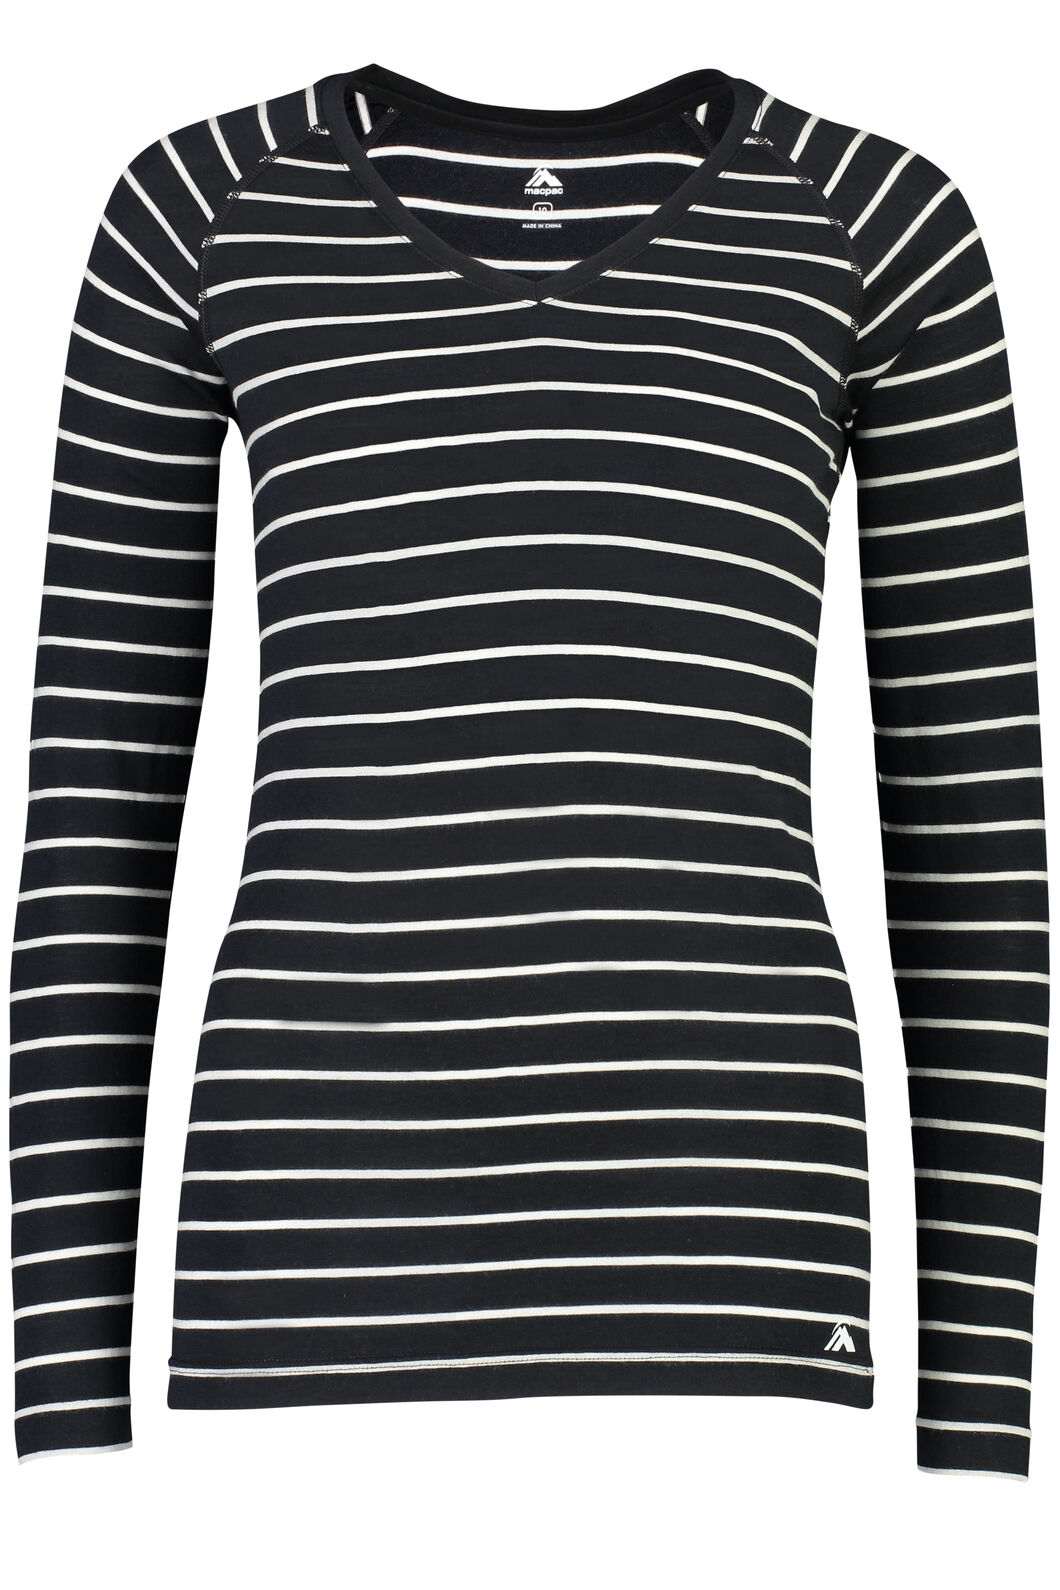 150 Merino V-Neck Top - Women's, Black/White Stripe, hi-res